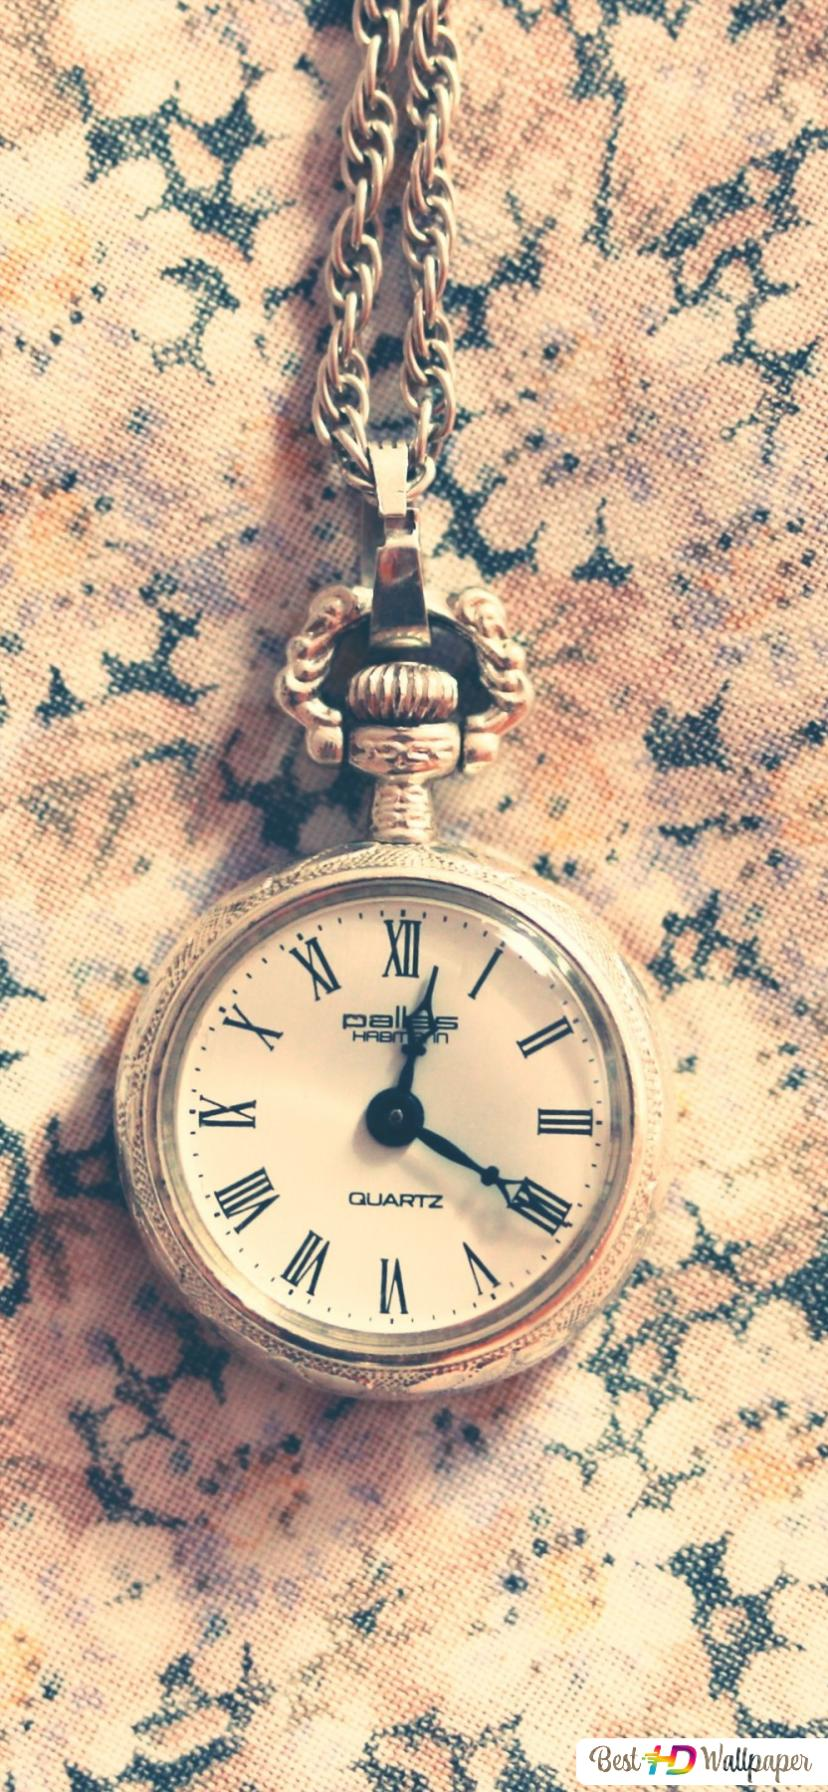 Vintage Watch Background Hd Wallpaper Download